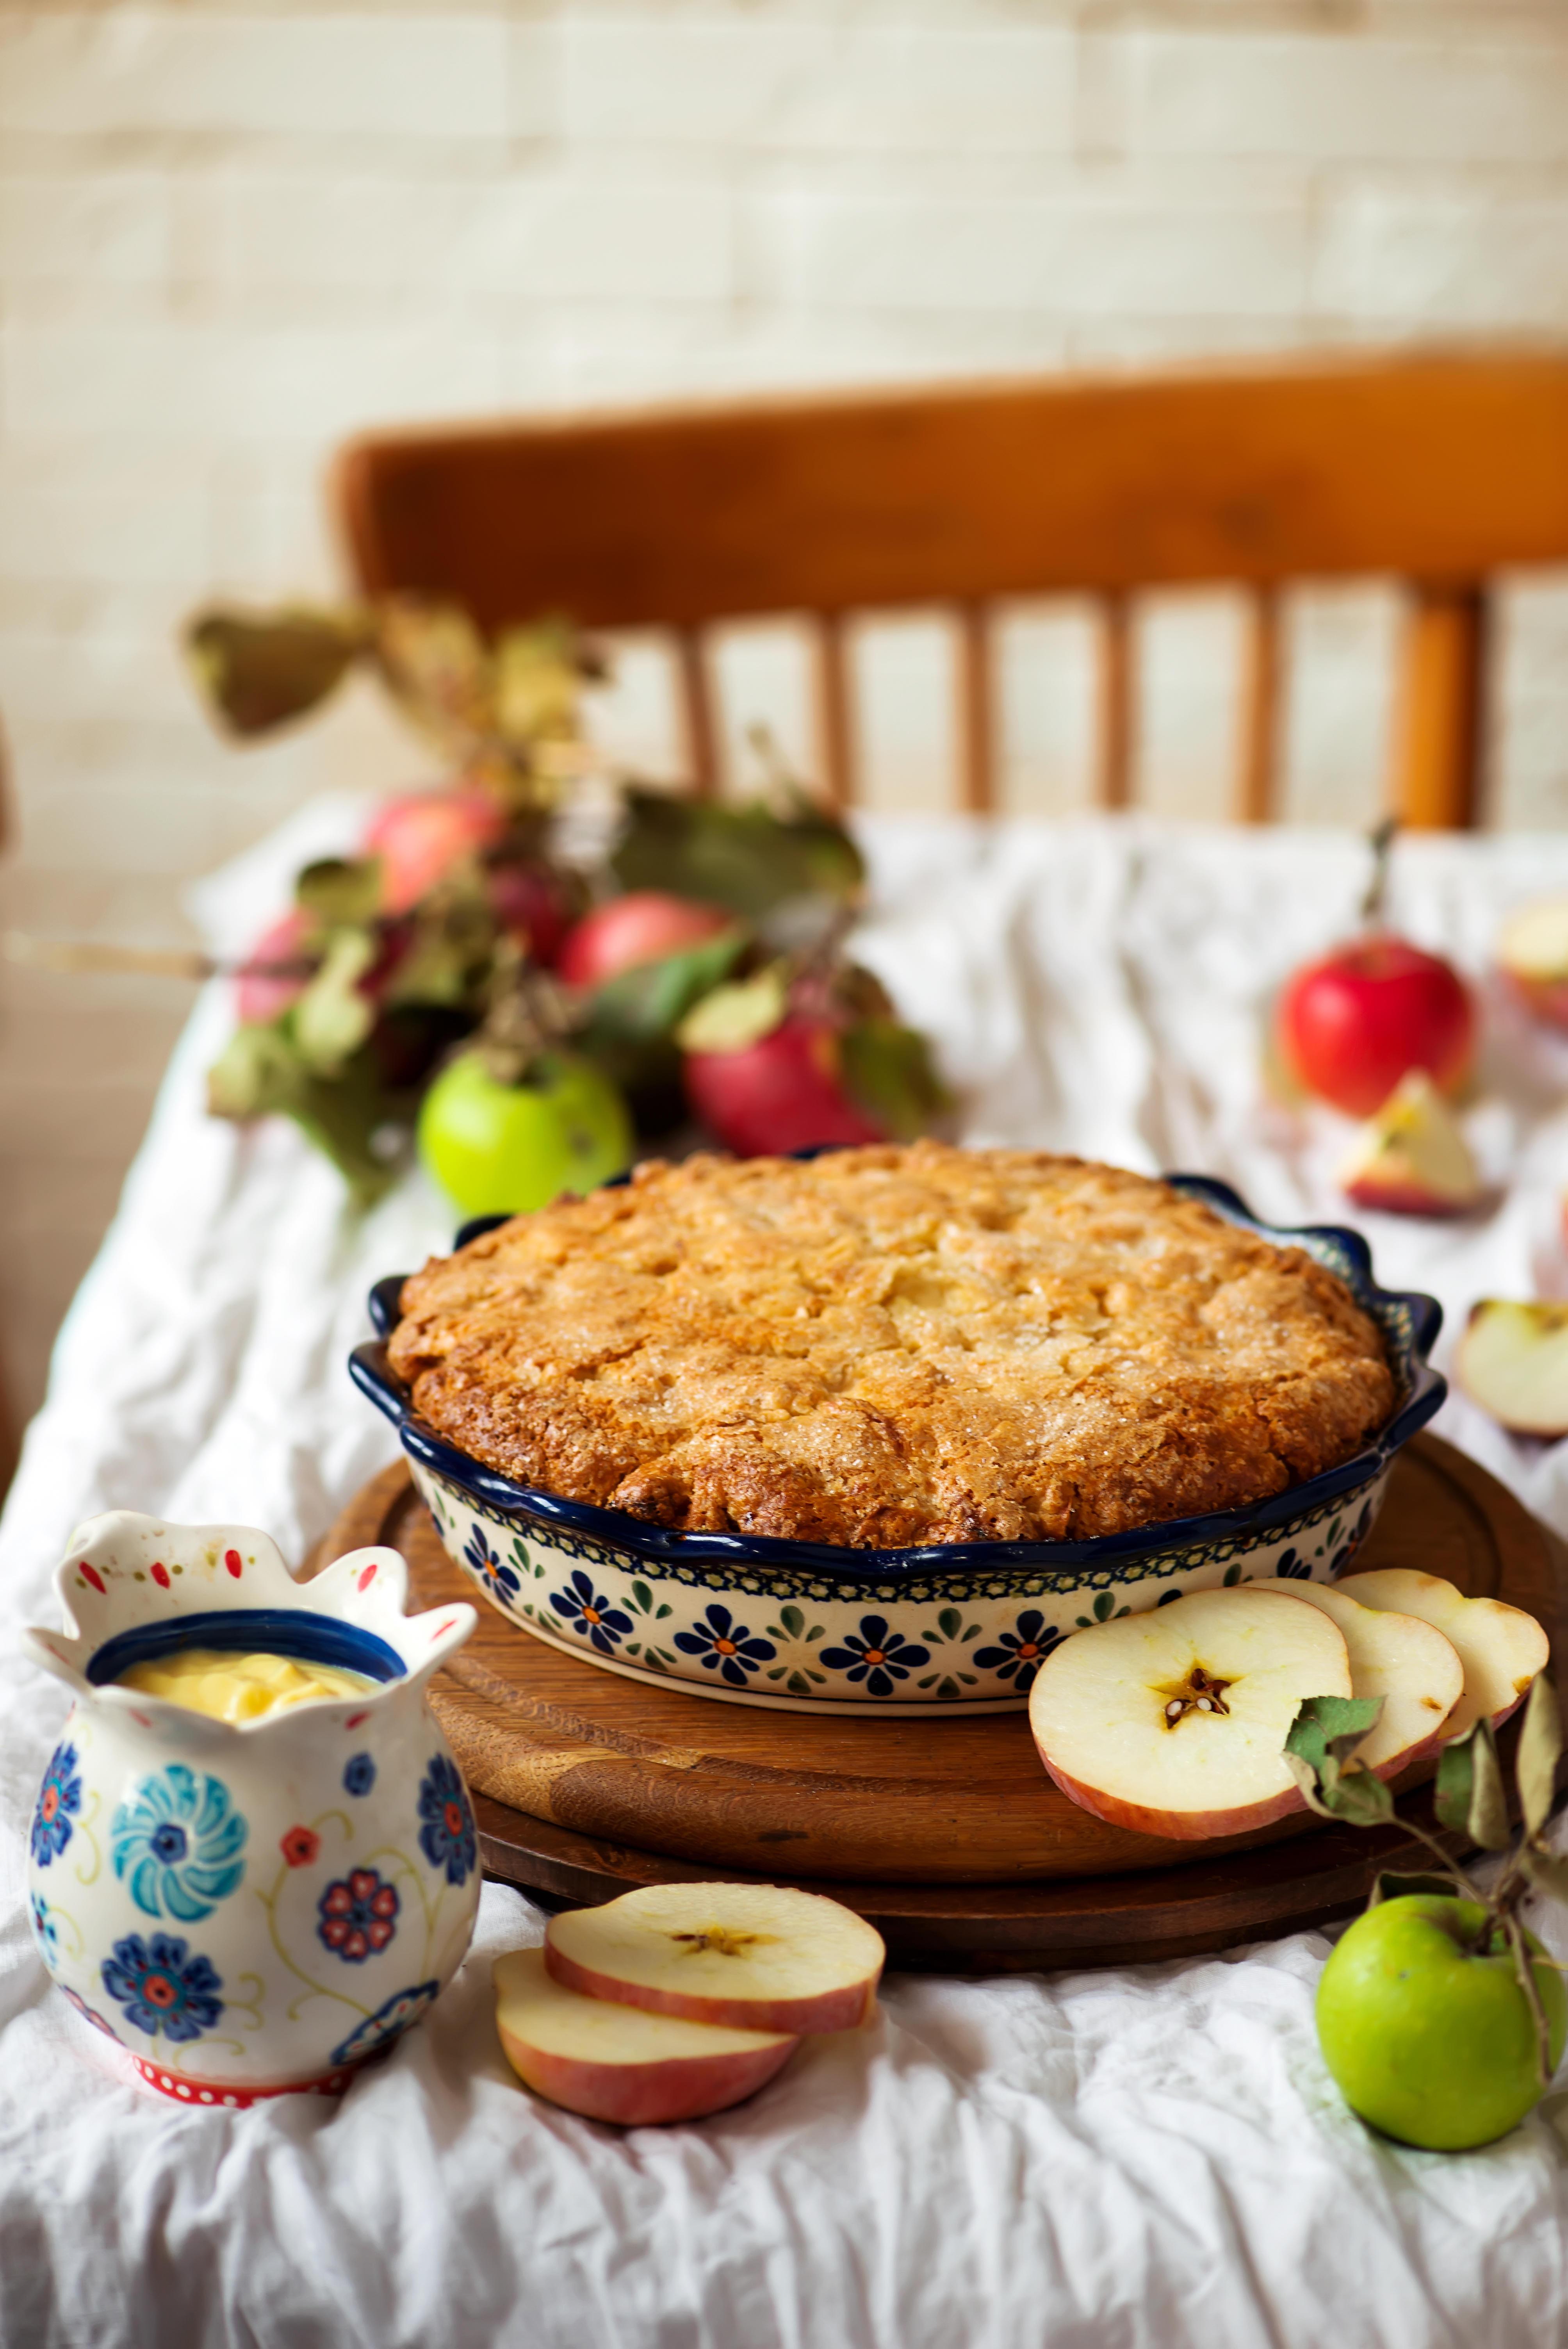 Irish apples cake with custard. rustic photo.selective focus